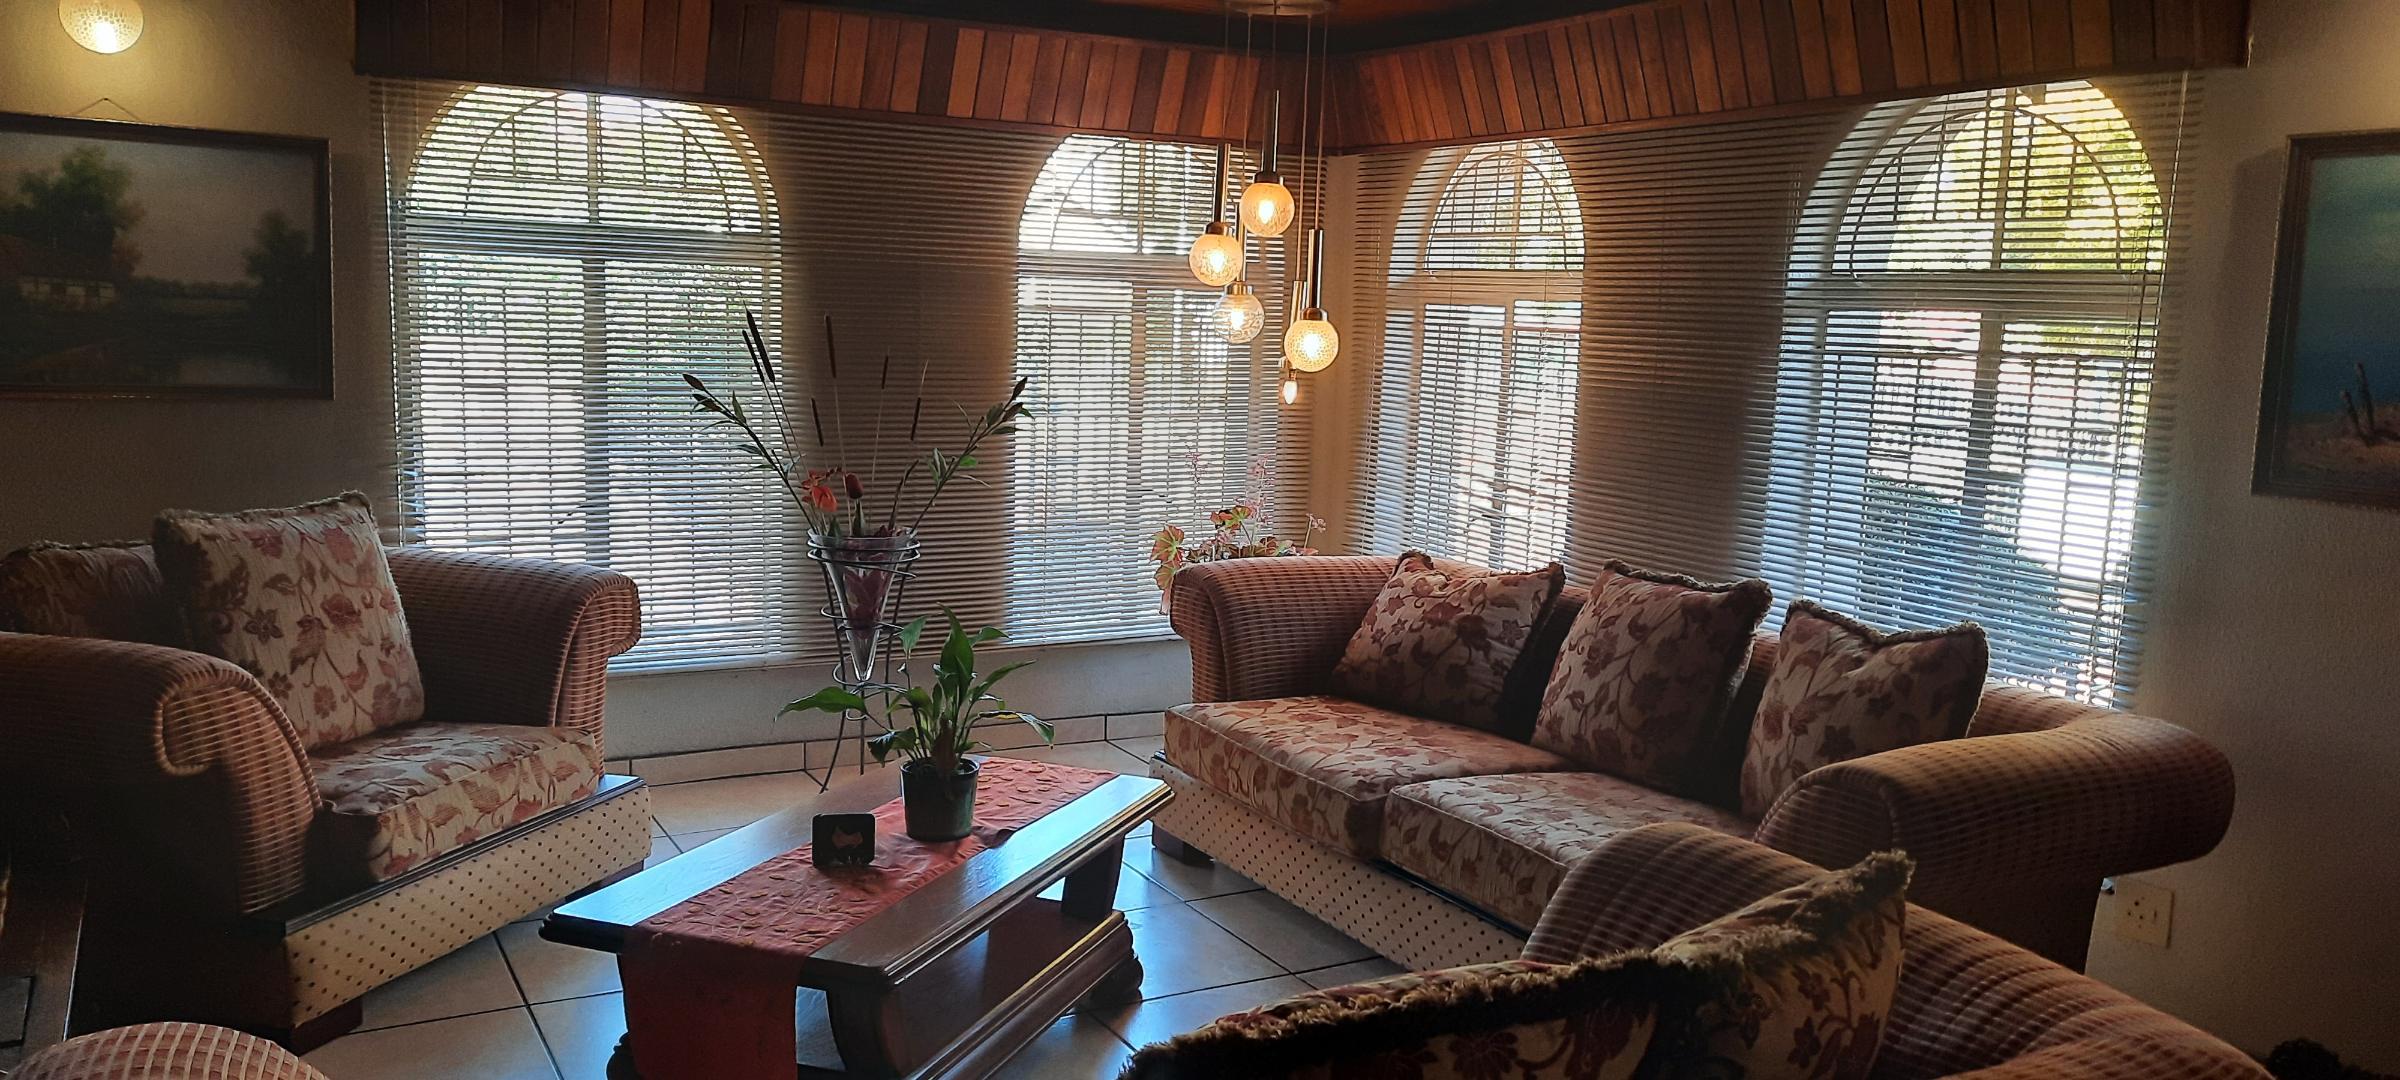 4 Bedroom House For Sale in Dennesig